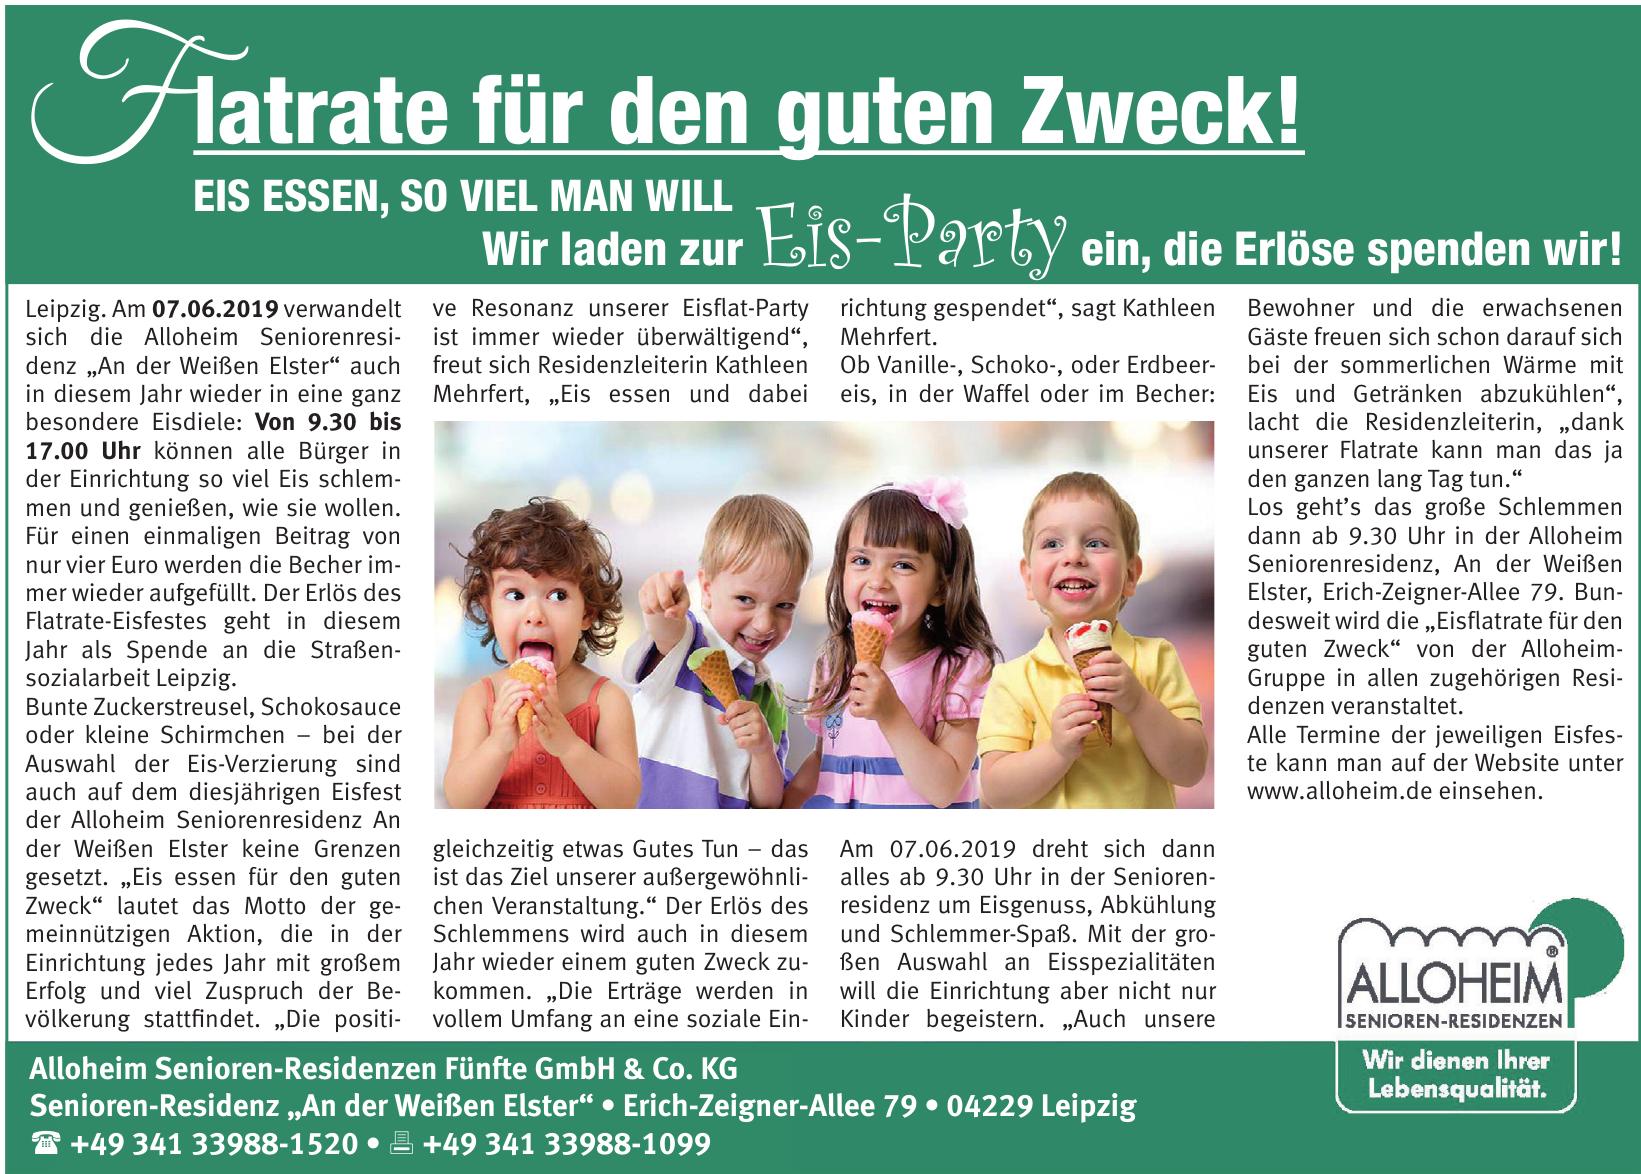 Alloheim Senioren-Residenzen Fünfte GmbH & Co. KG